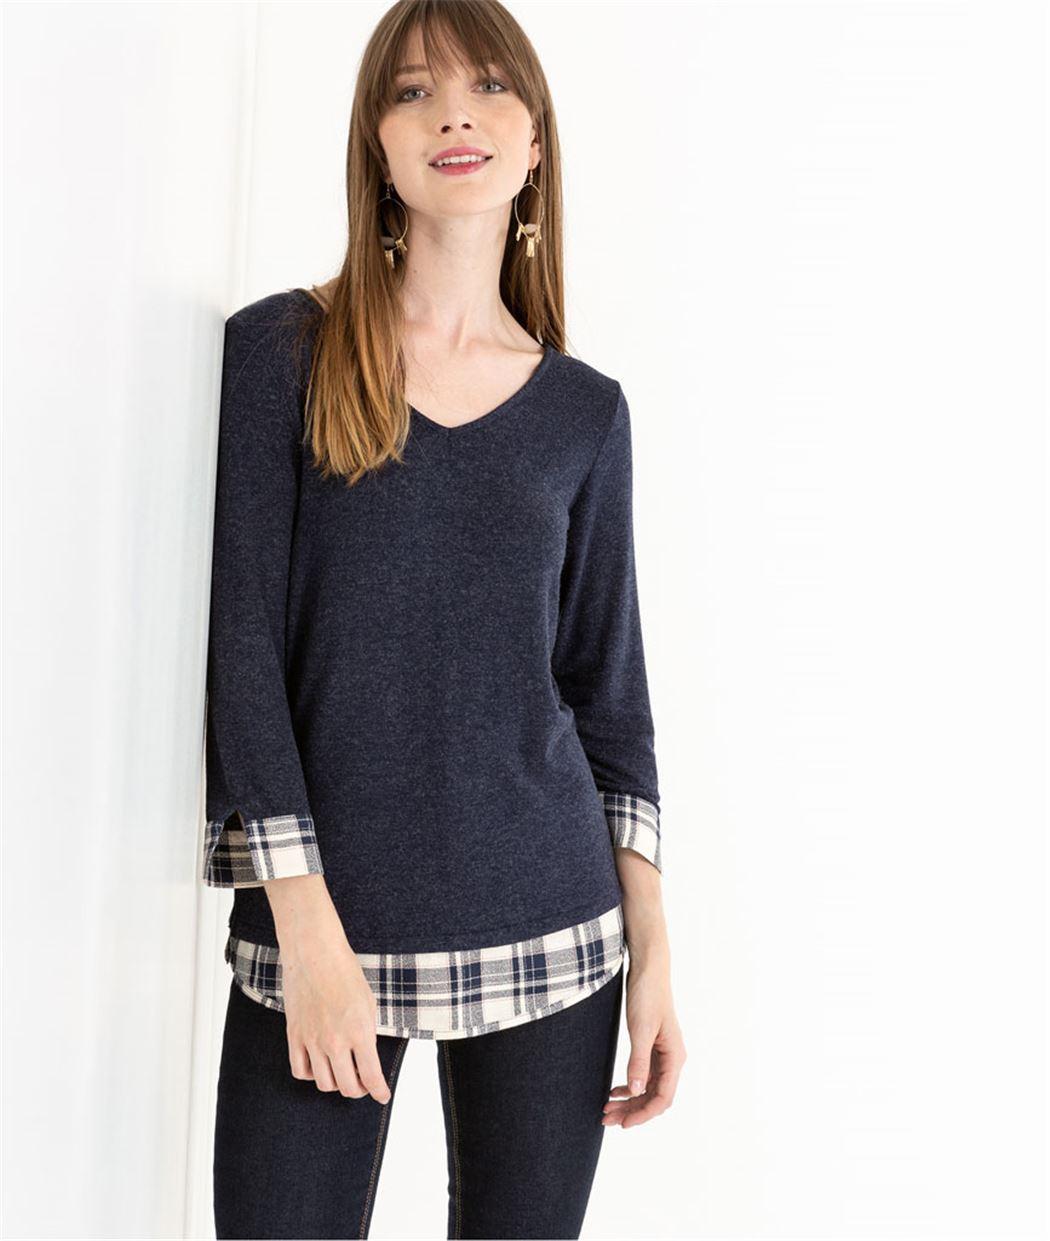 T-shirt femme 2 en 1 avec noeud BLEU